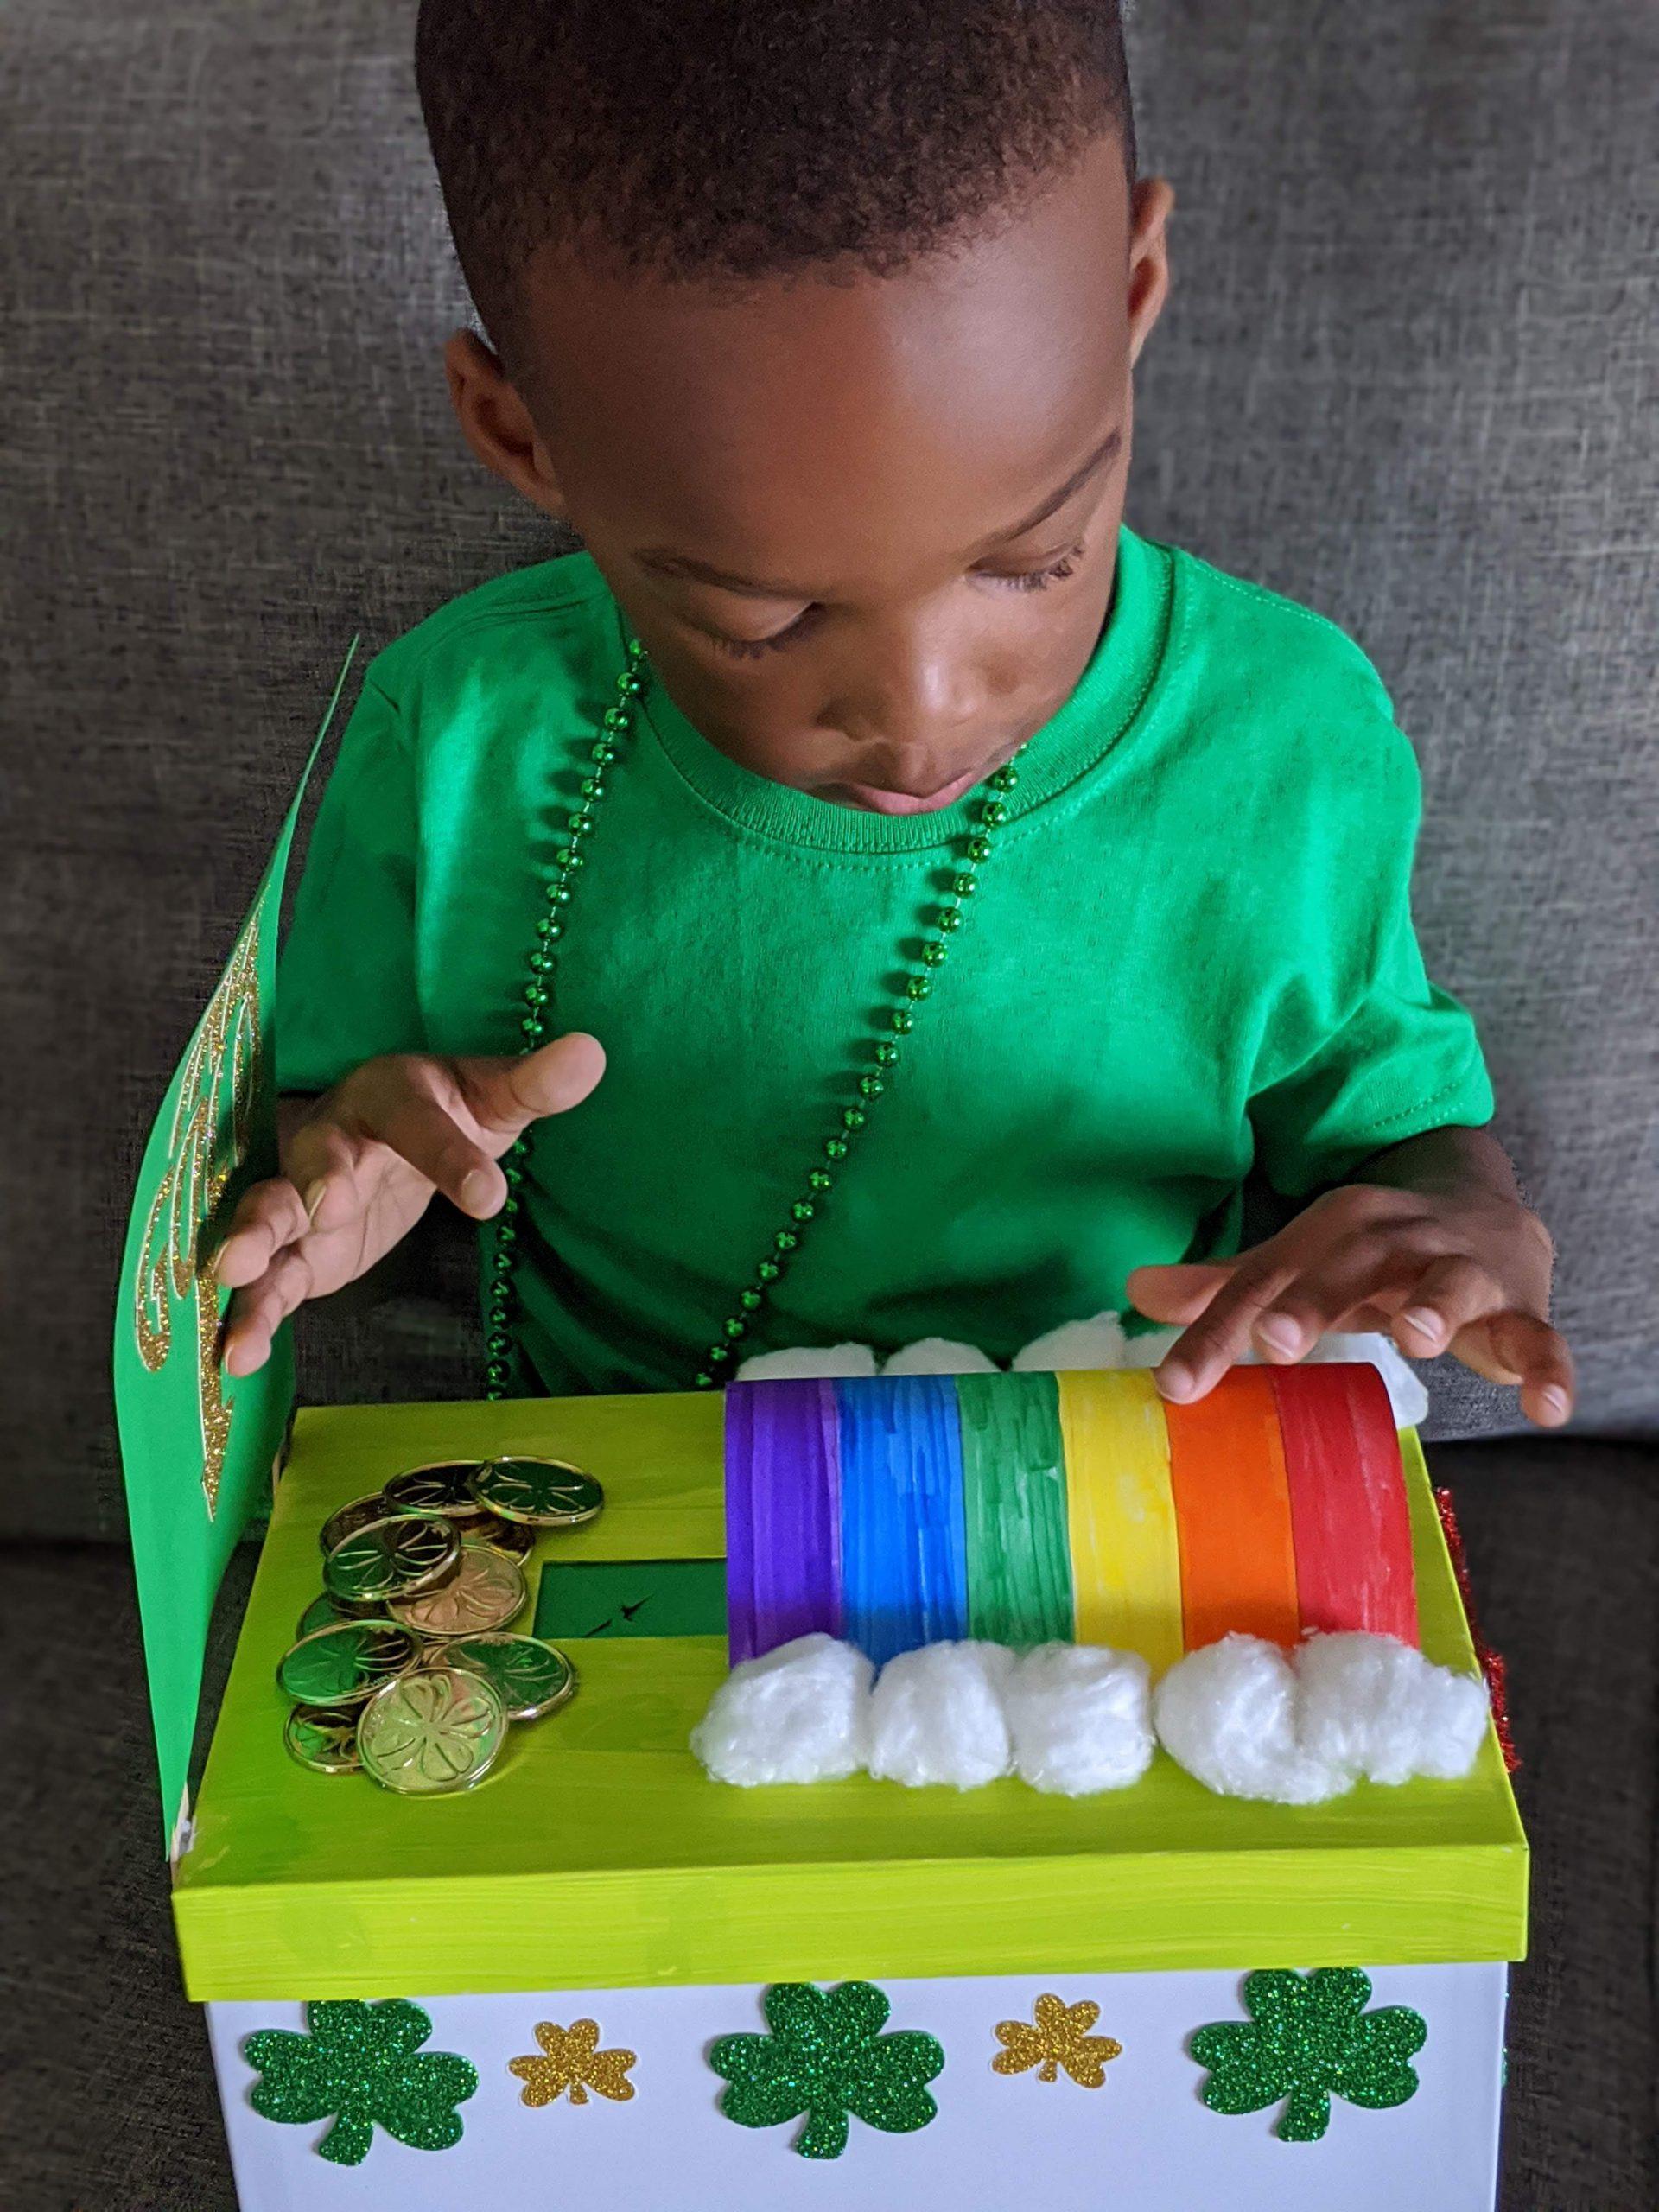 child holding leprechaun trap